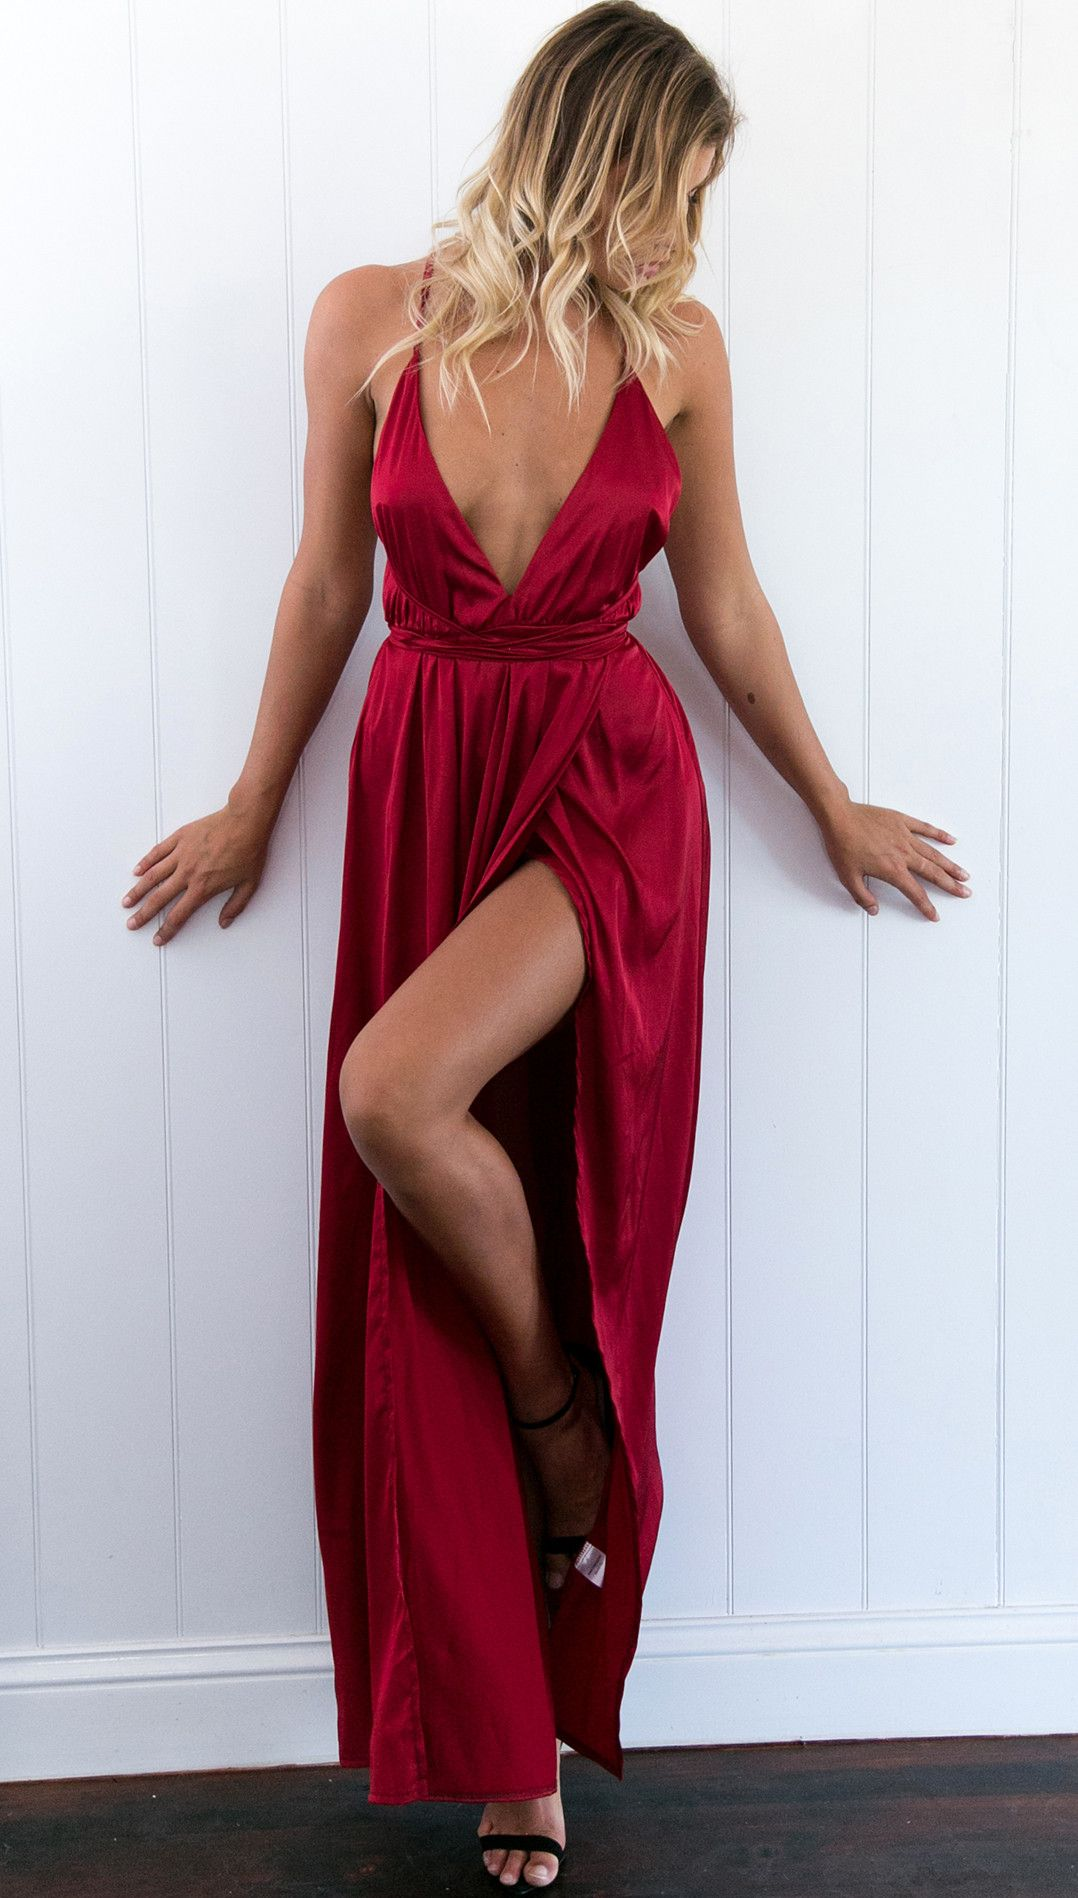 a1486e3ca7ae Sexy Red Wine V Neck Prom Dress, Open Back Prom Dress, Sexy Maxi ...